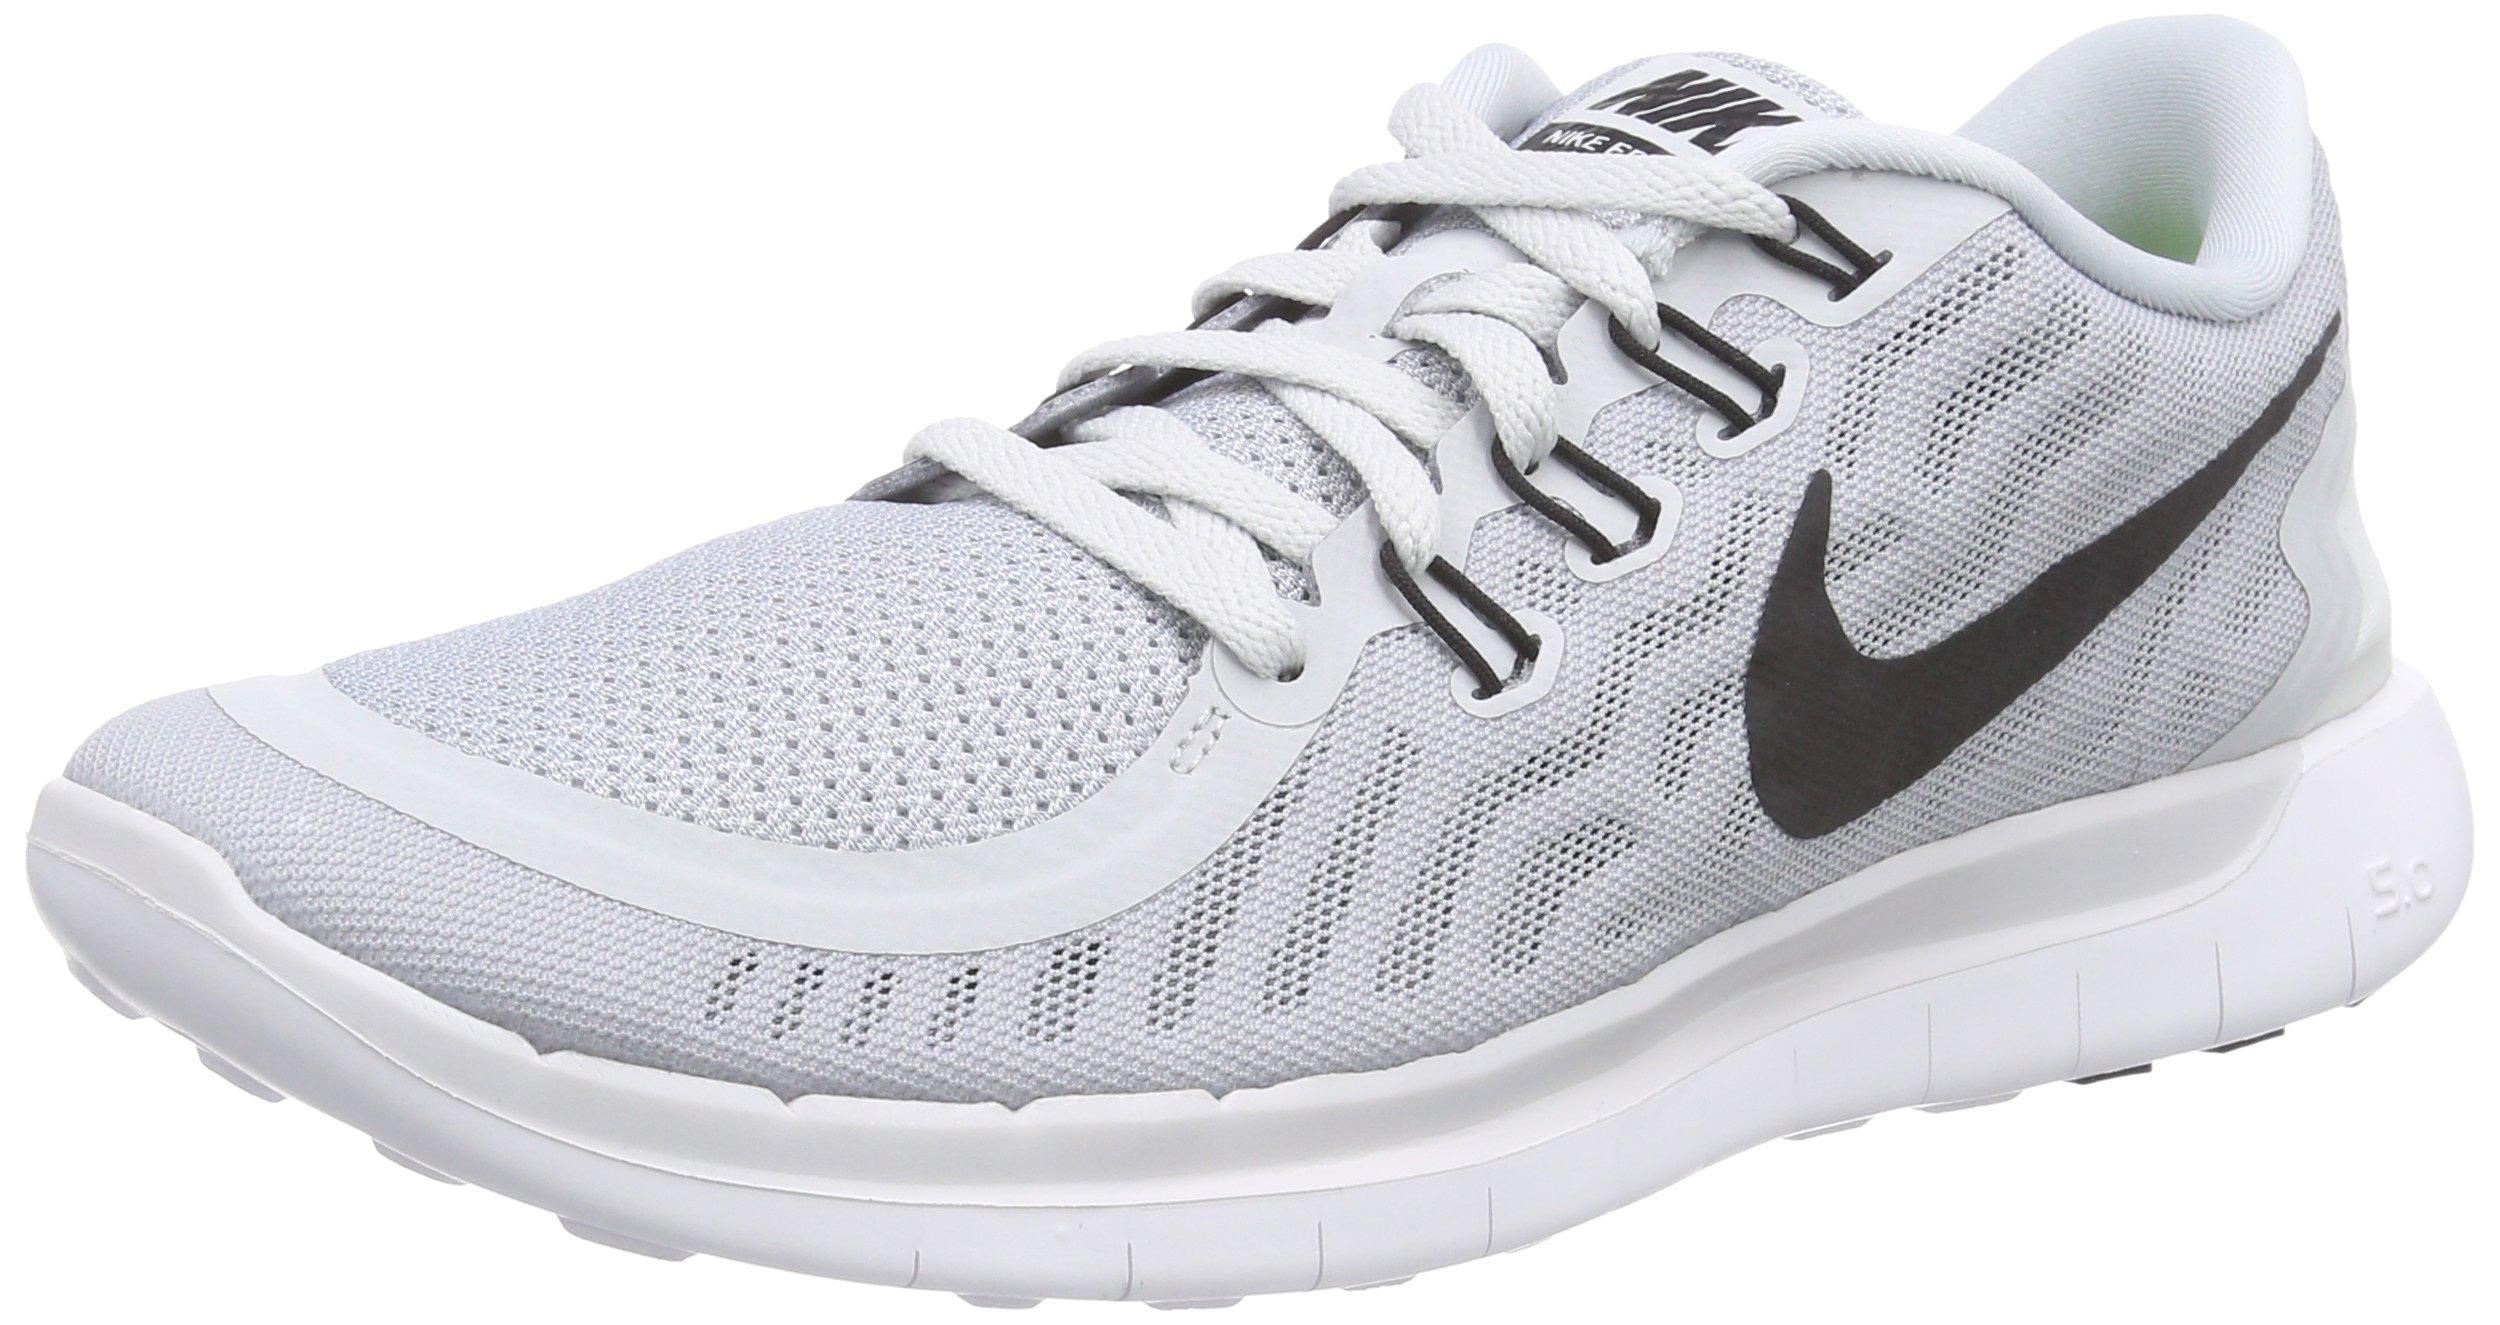 11ab1b86db77 Galleon - Nike Men s Free 5.0 Running Shoe Pure Platinum Wolf Grey Cool Grey  Black Size 10 M US